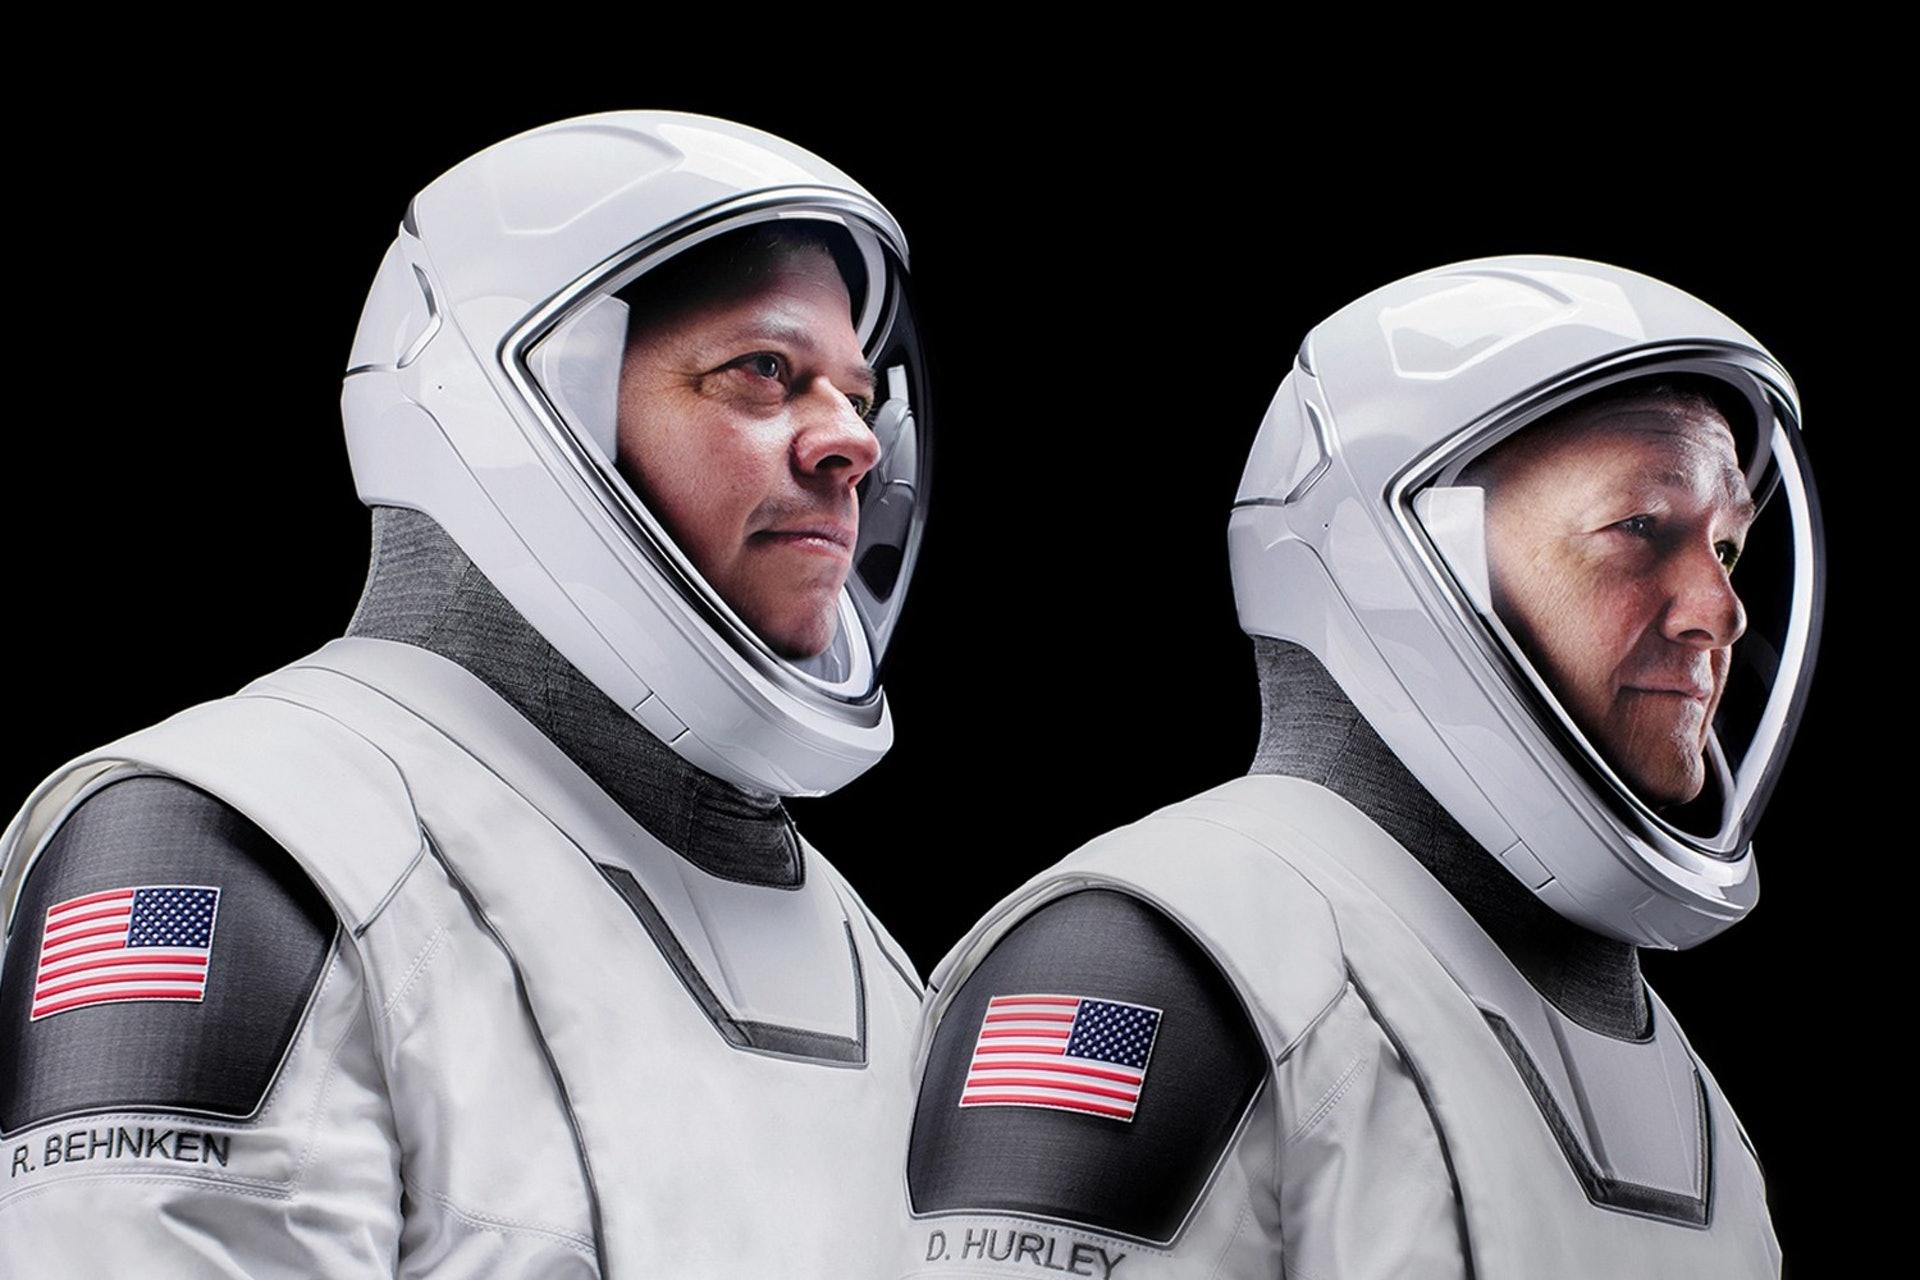 Bob Behnken及Doug Hurley所穿的太空衣的外觀設計出自荷里活著名服裝設計師Jose Fernadez之手(圖片來源:SpaceX)